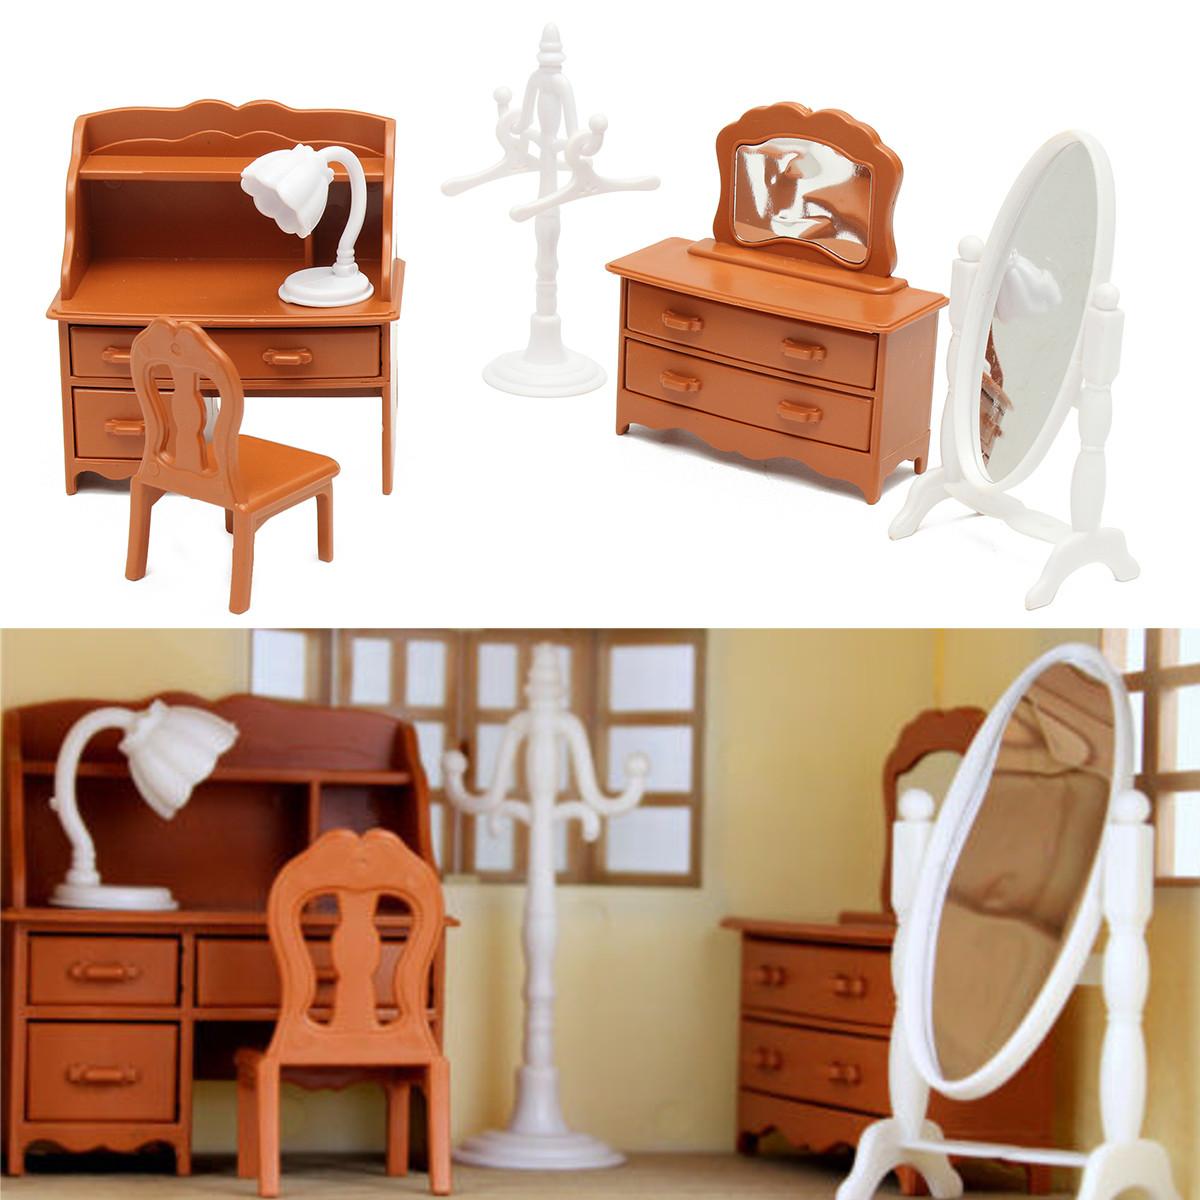 Marsin Vintage Plastic Miniature DollHouse Furniture Set Bedroom Decor Kids Toy Gifts